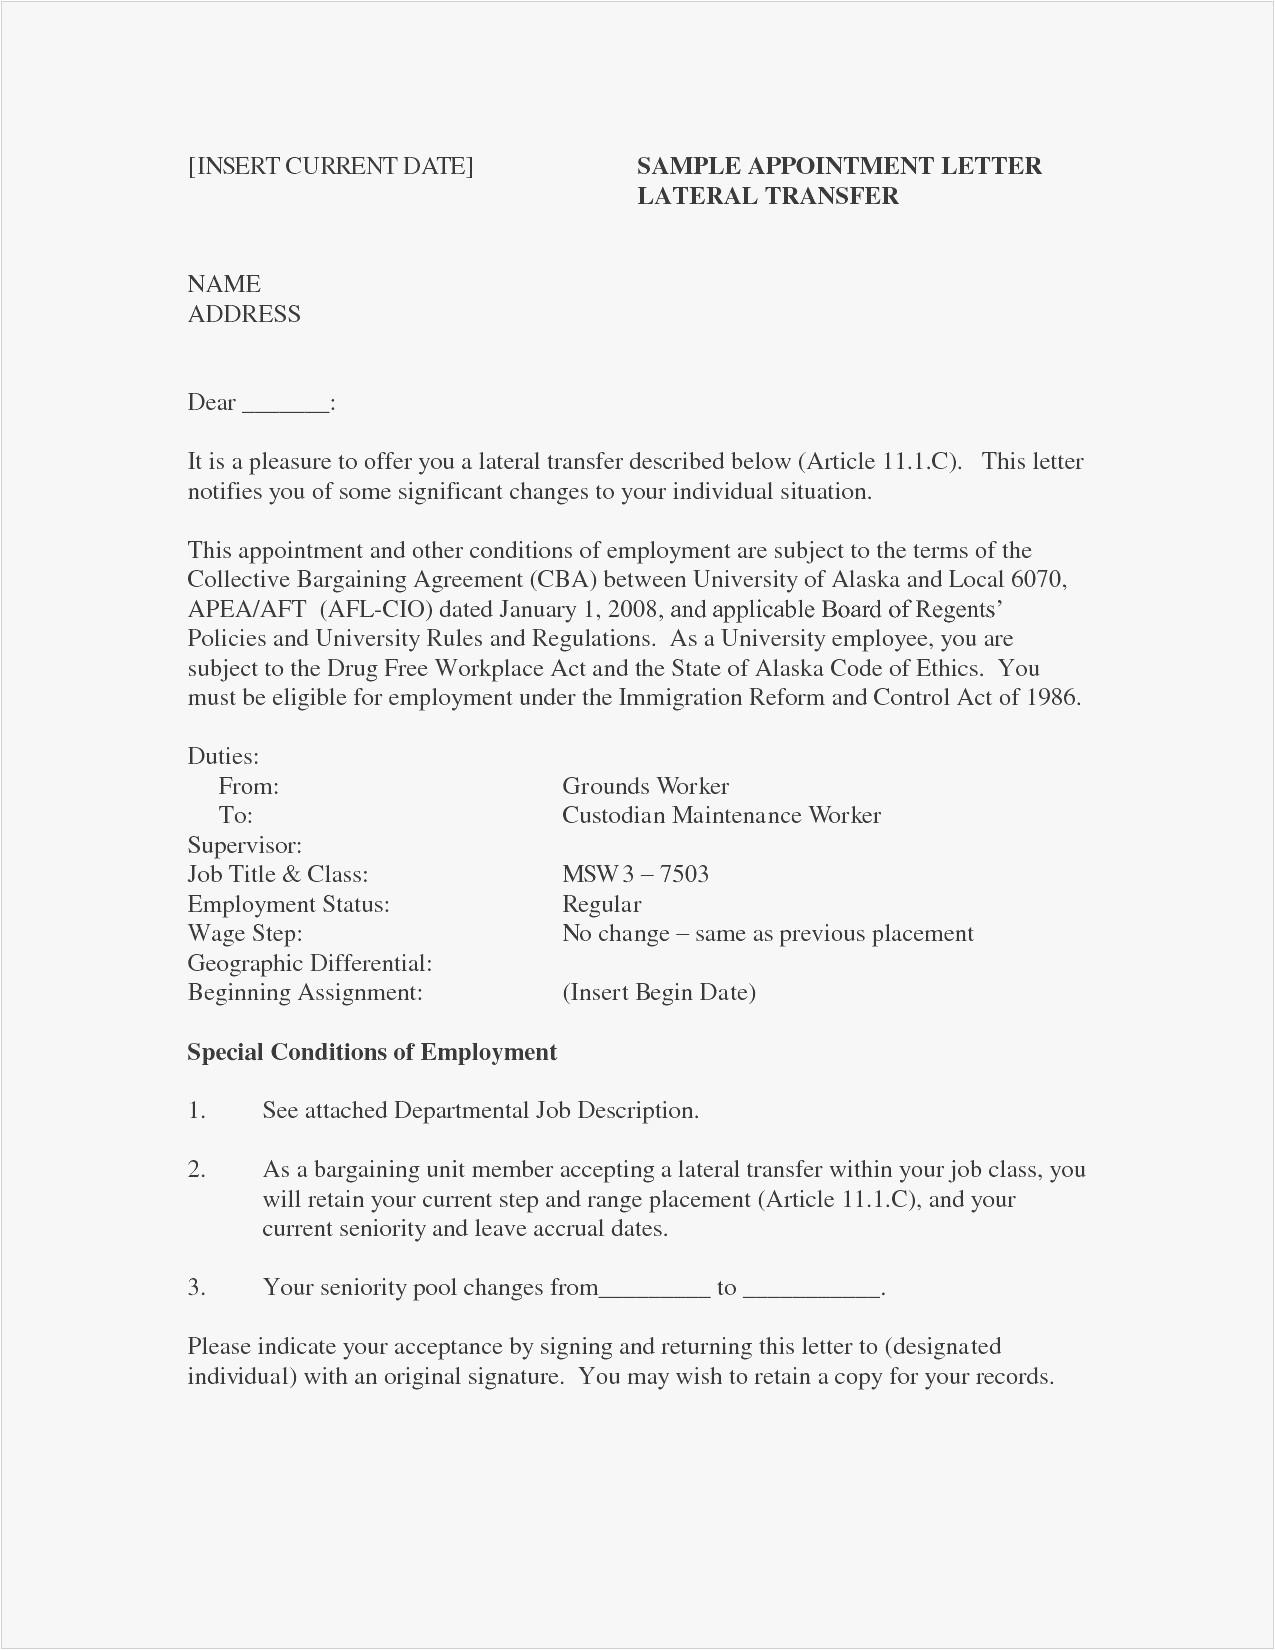 ffa job interview cover letter sample new sample buyer resume 2